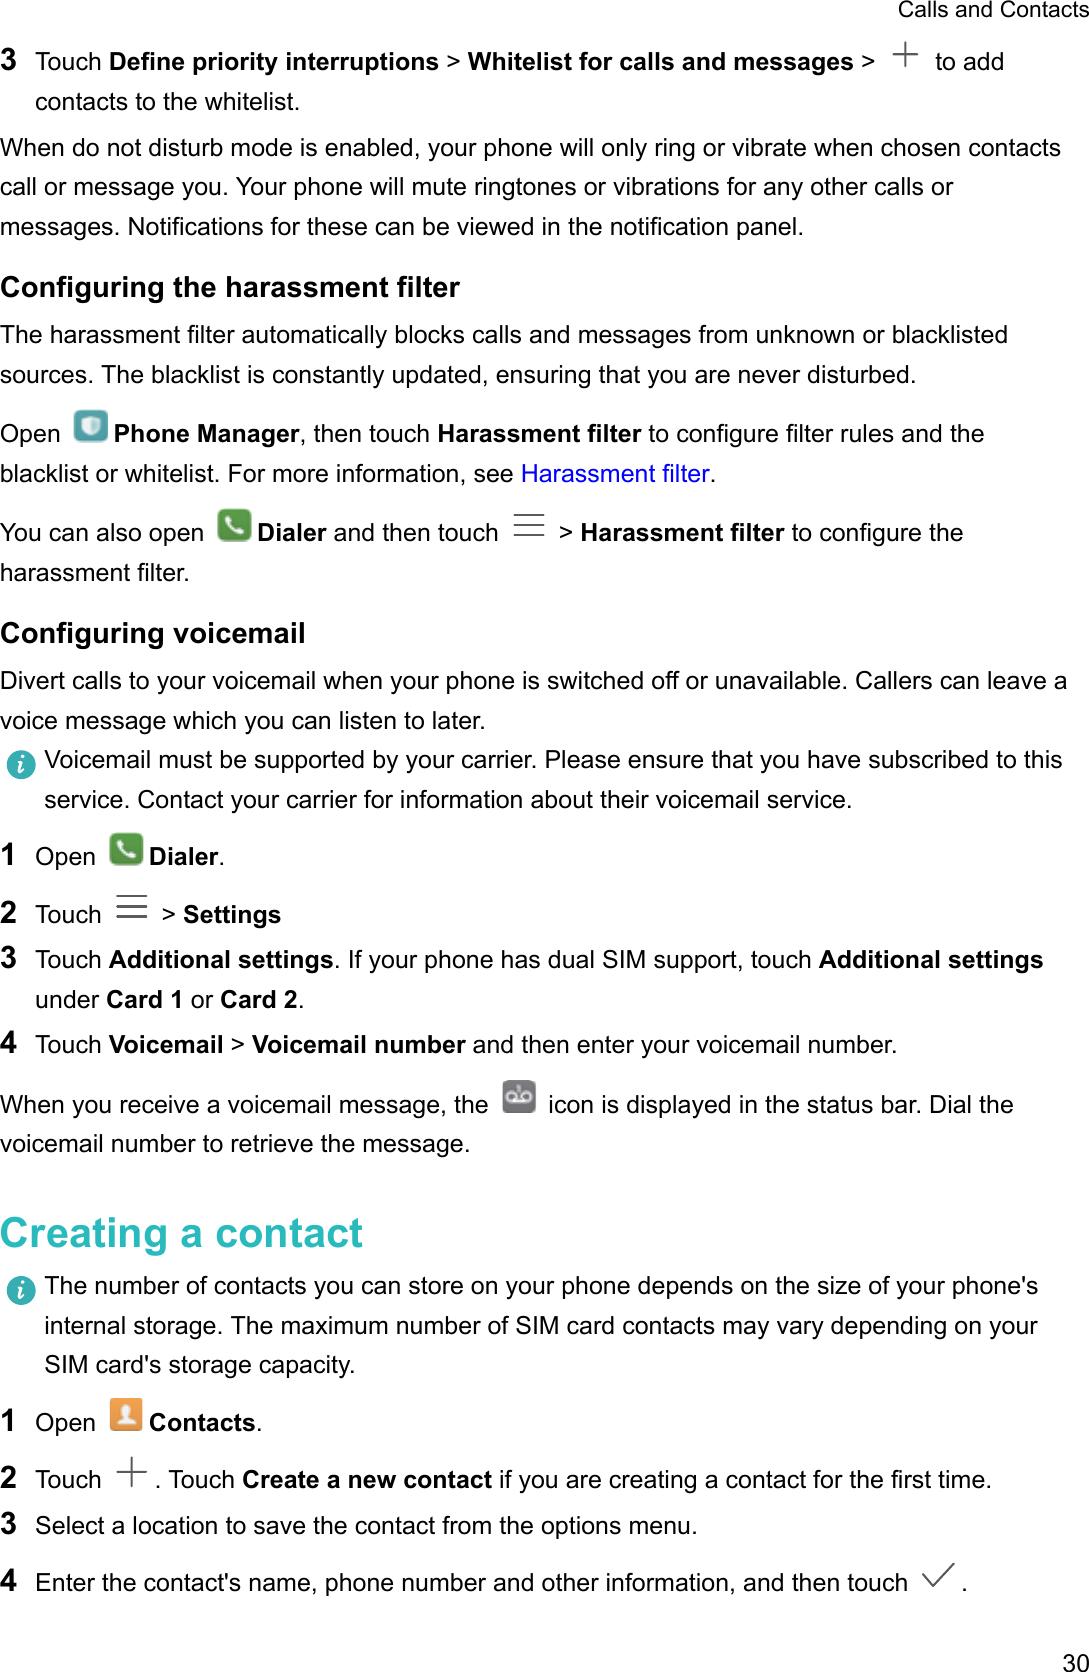 Huawei Y5 2017 User Guide ( Mya L03&L23&L02&L22, 01, English)